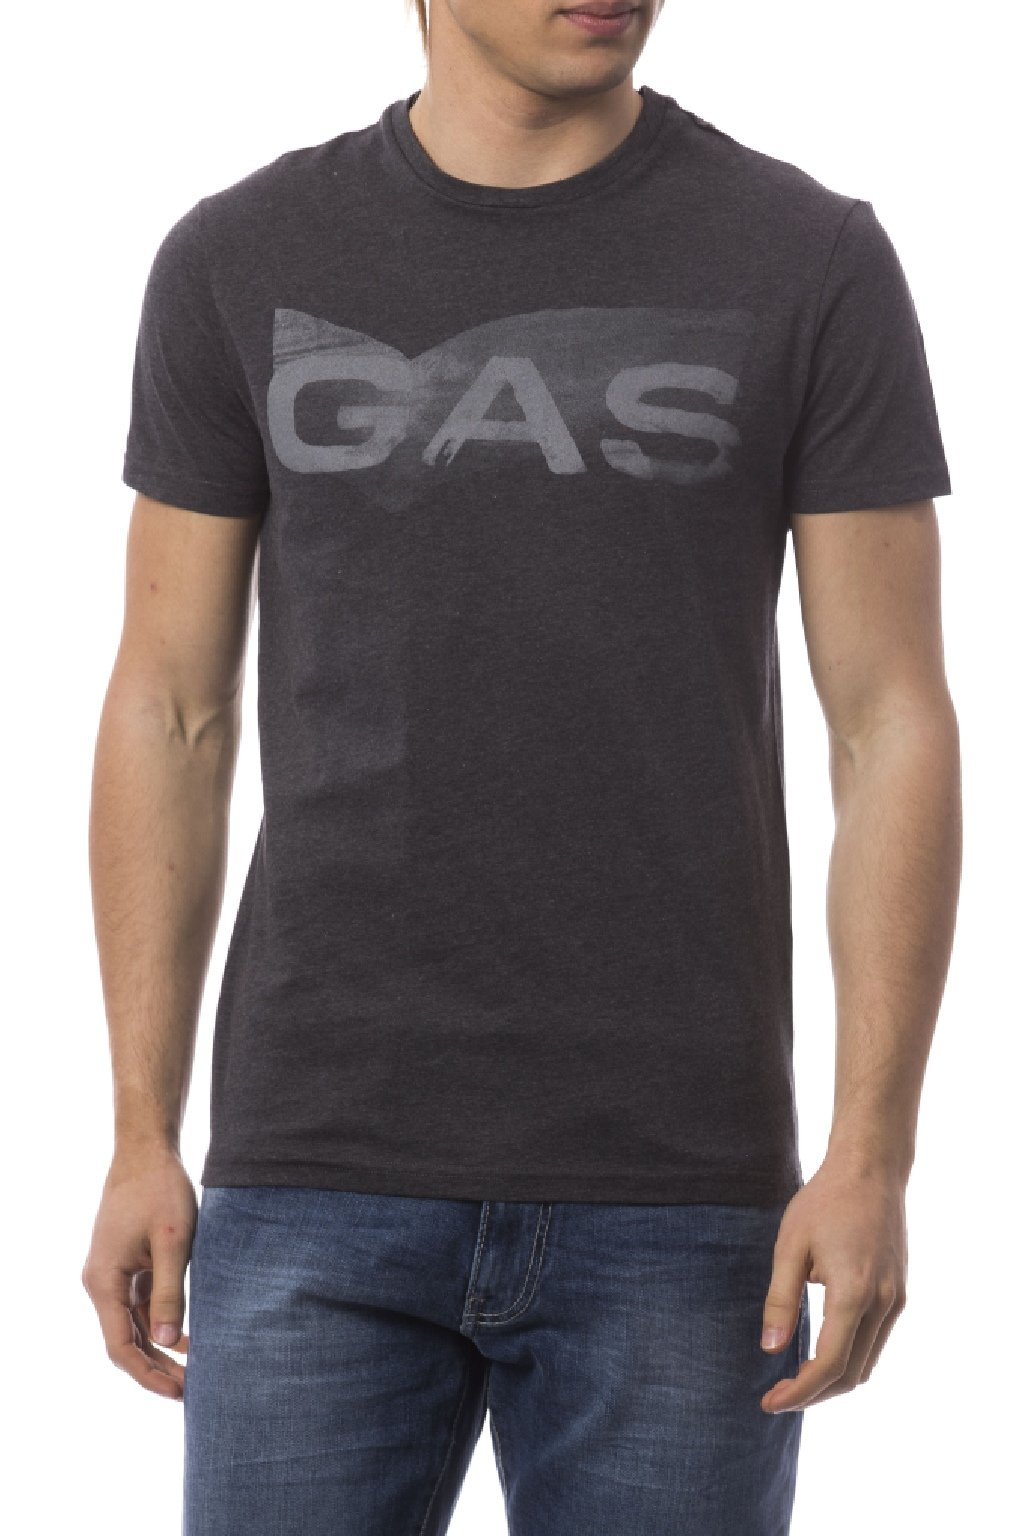 Znackova panske tricko gas jeans sede (3)